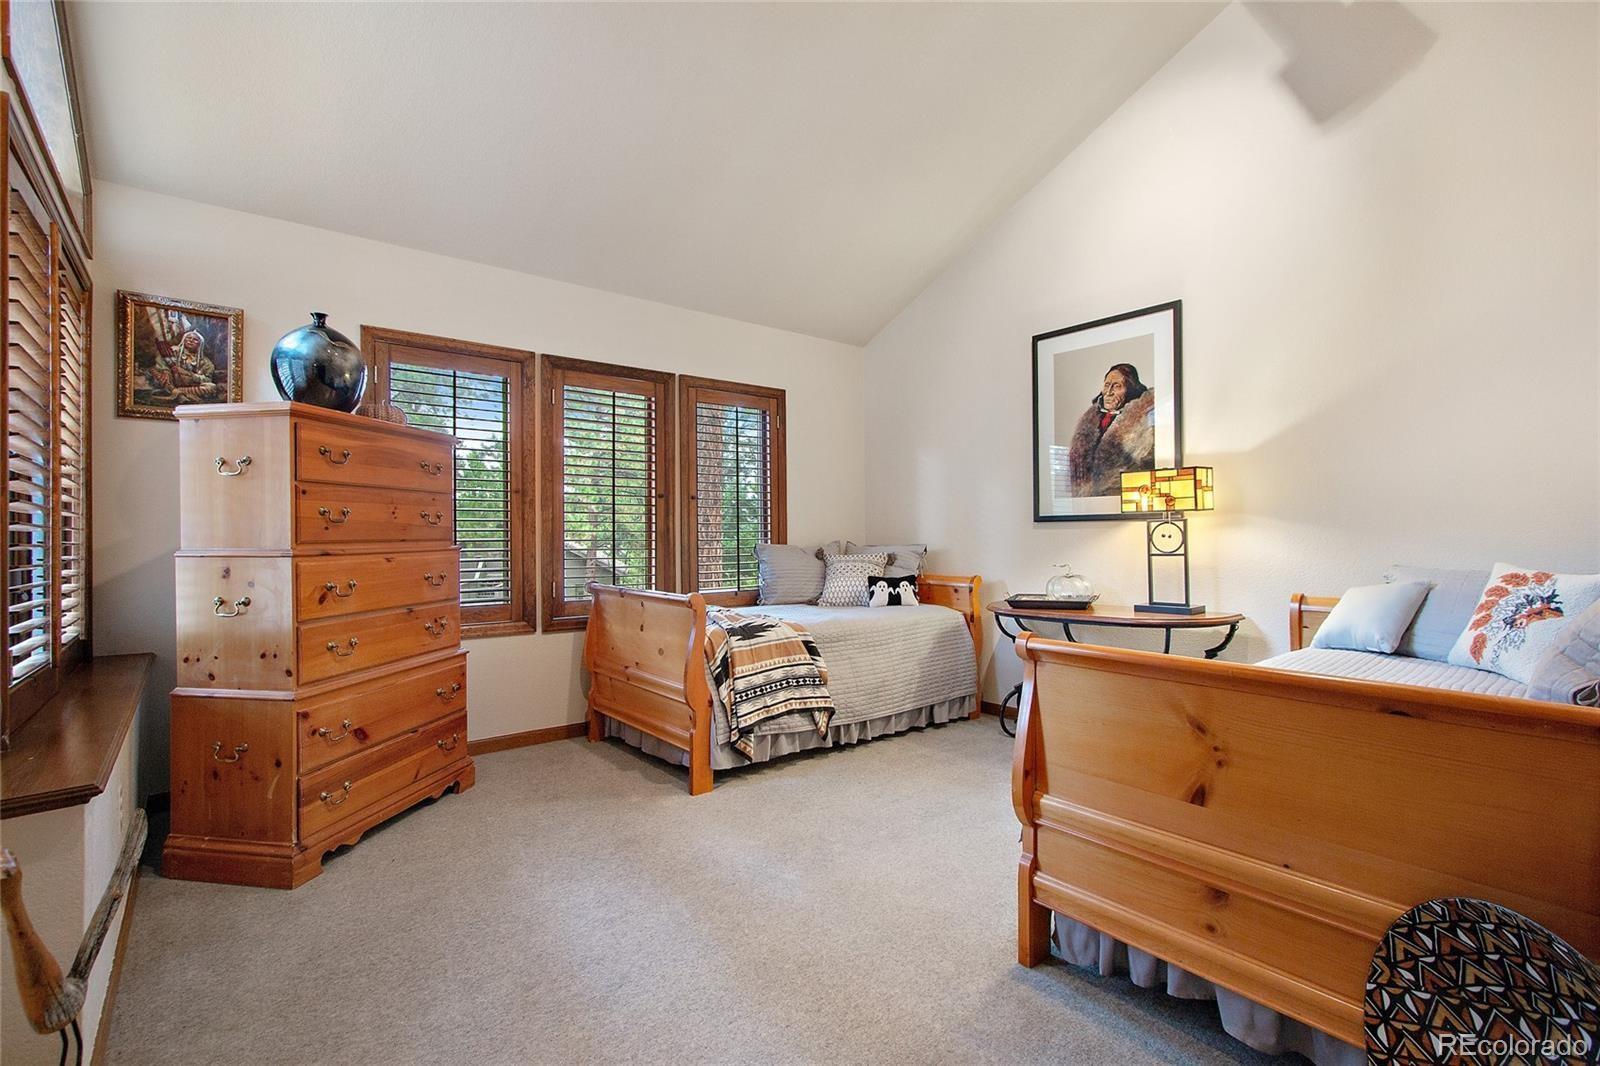 MLS# 1902527 - 21 - 29080 Pinewood Vista Drive, Evergreen, CO 80439